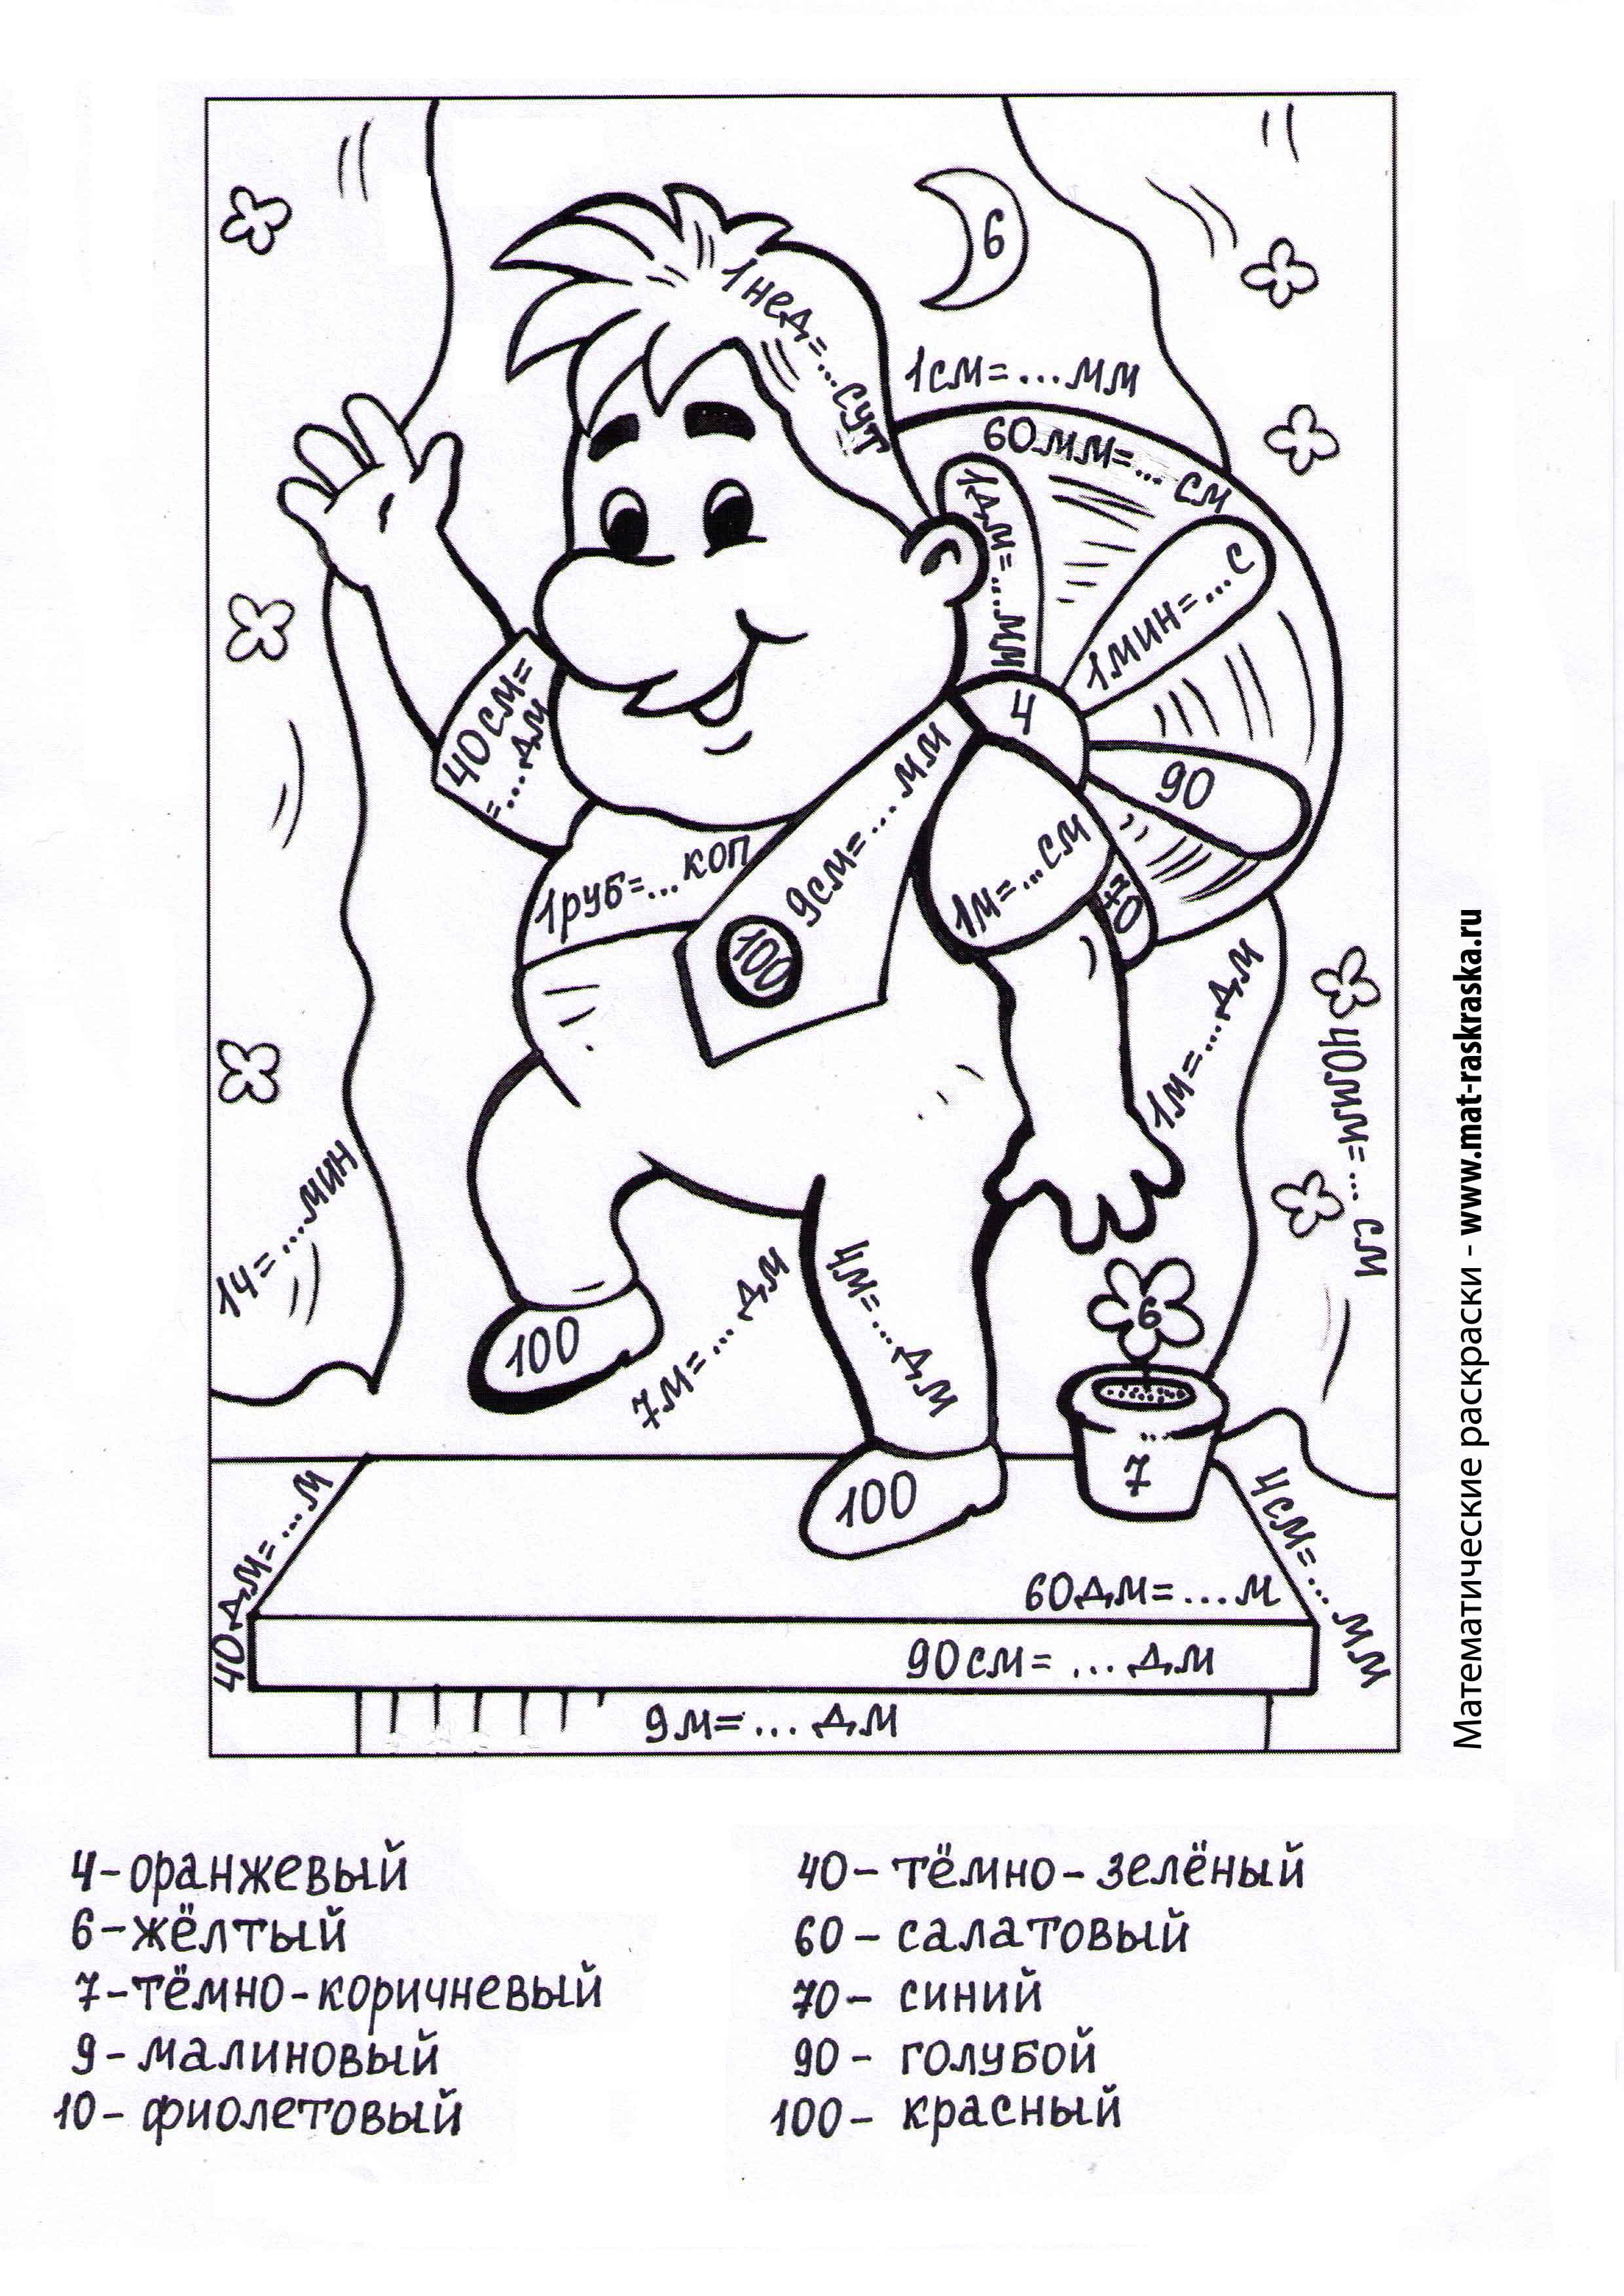 http://www.mat-raskraska.ru/images/stories/Raskraski/Edinitsi-izmerenia-dlini/karlson-sootnoshenie-velichin-ras1_big.jpg